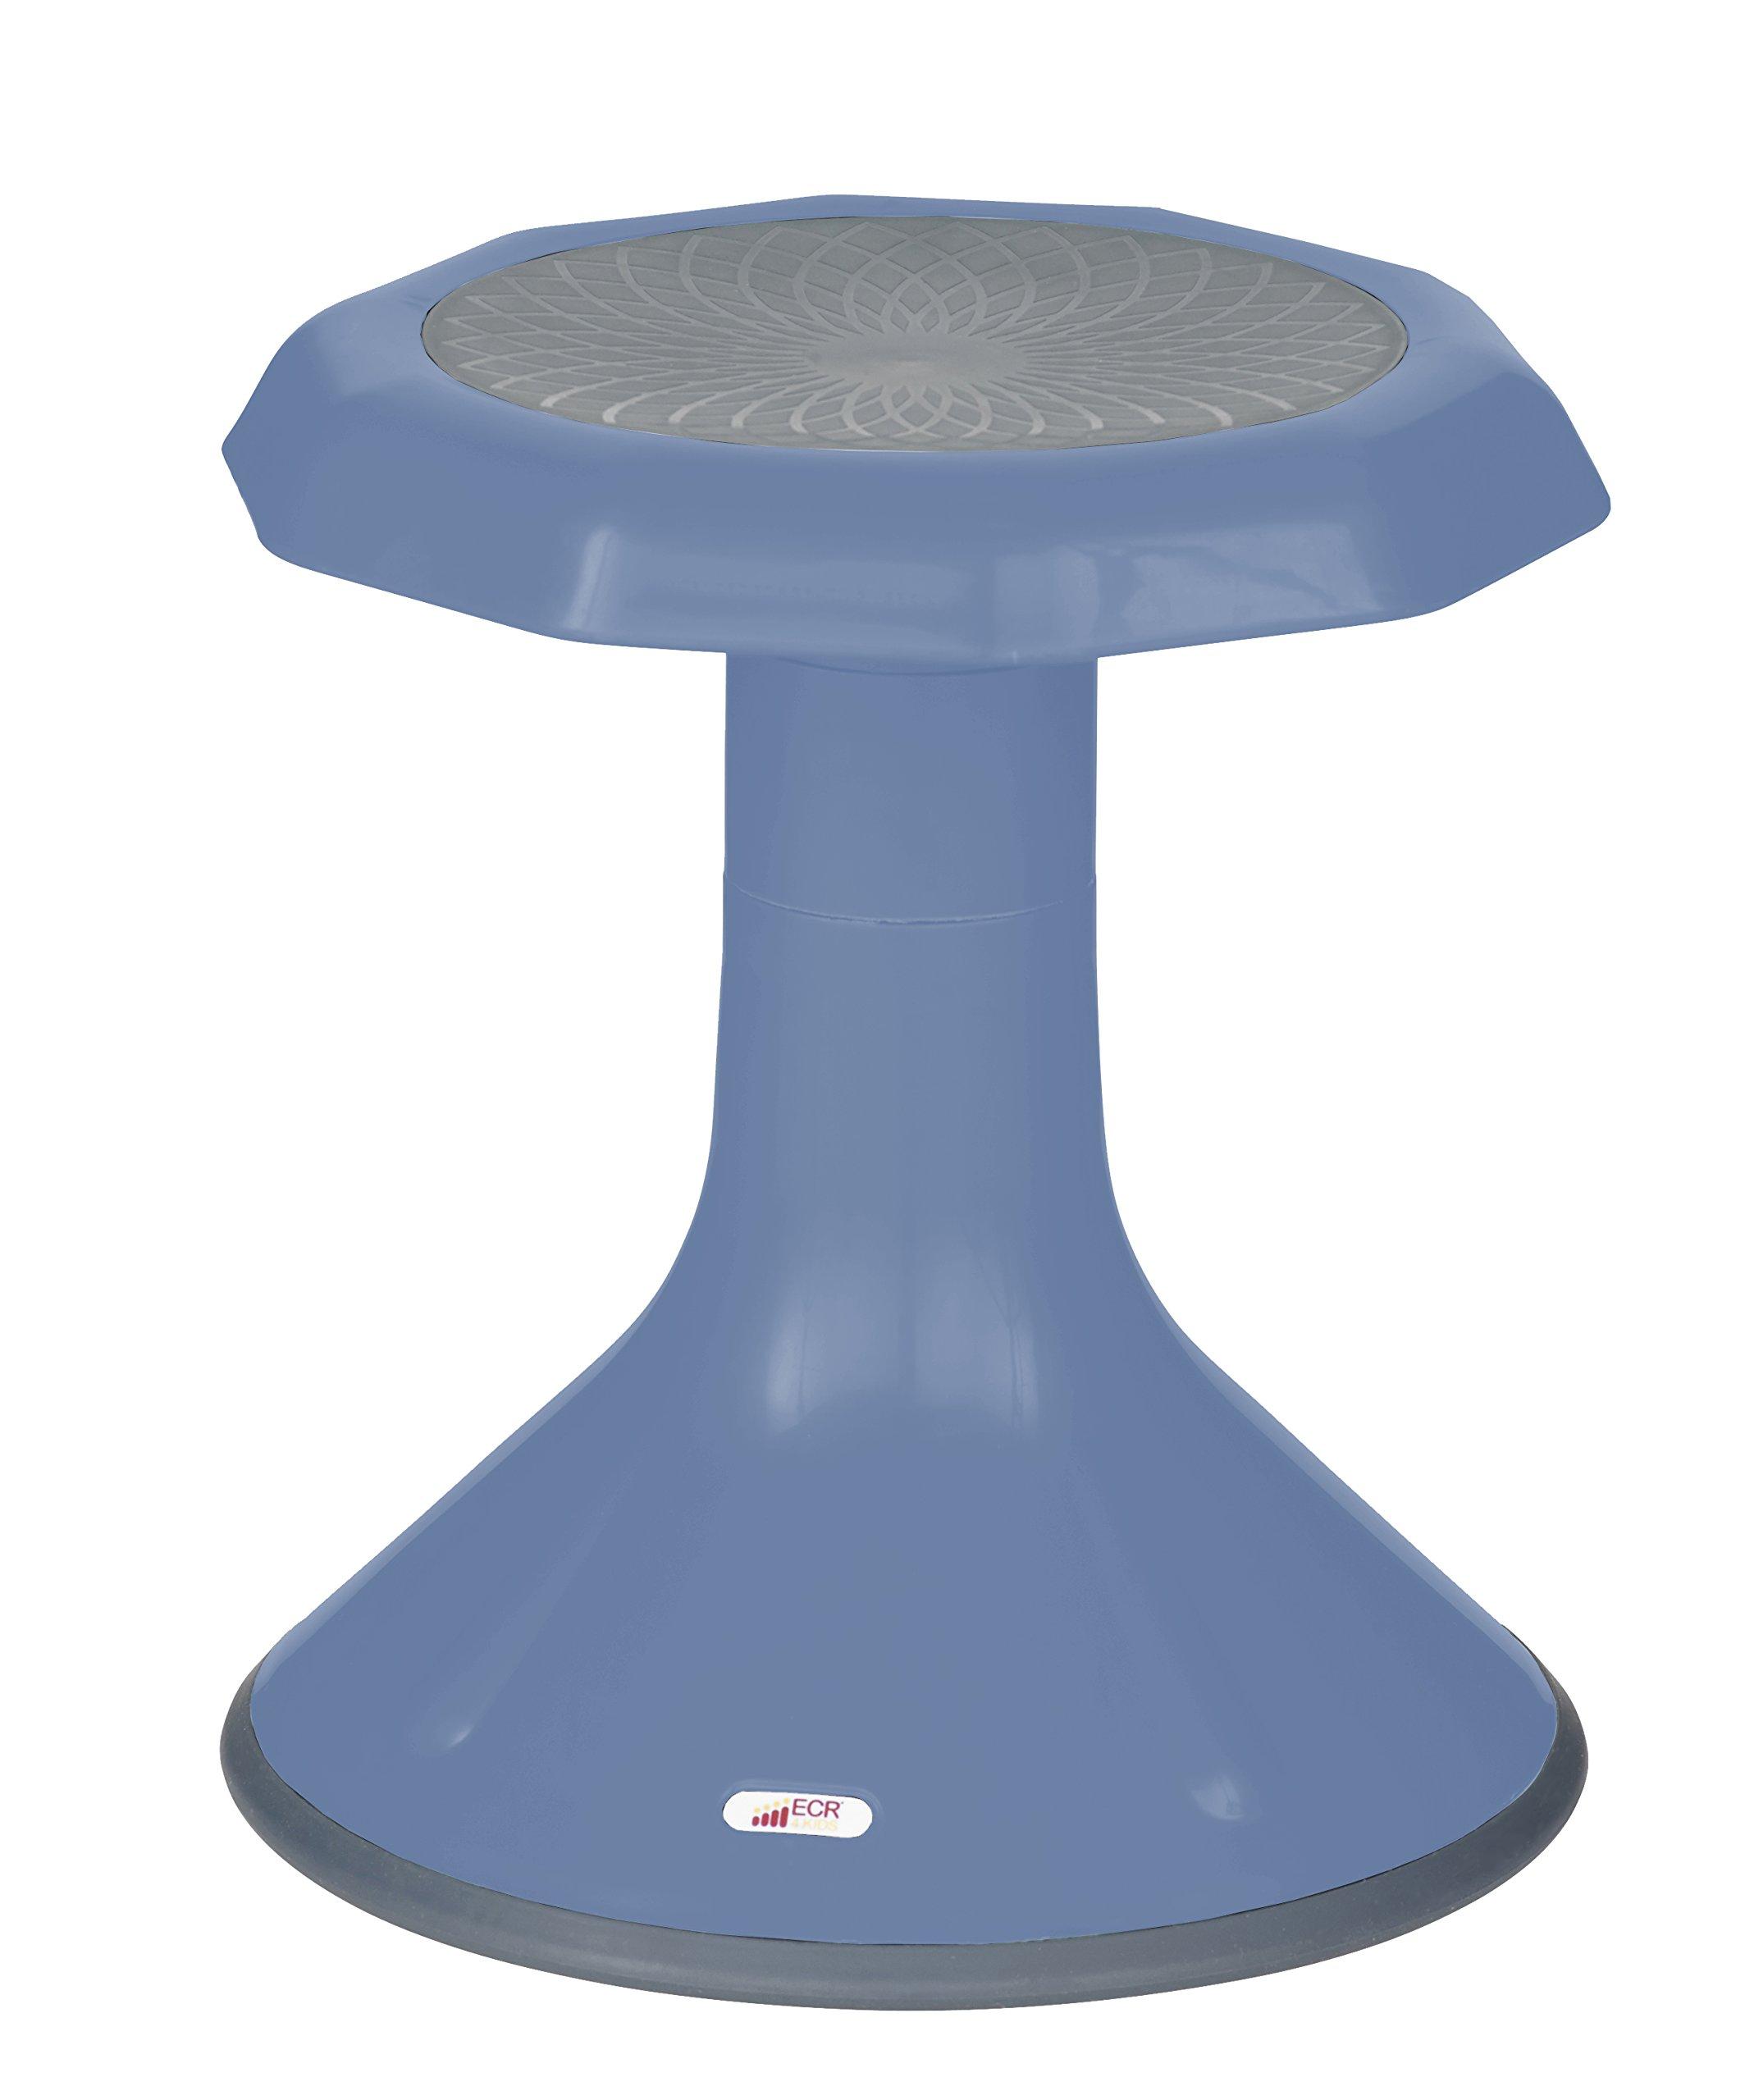 ECR4Kids ACE Active Core Engagement Stool for Kids, 15-Inch H - Powder Blue